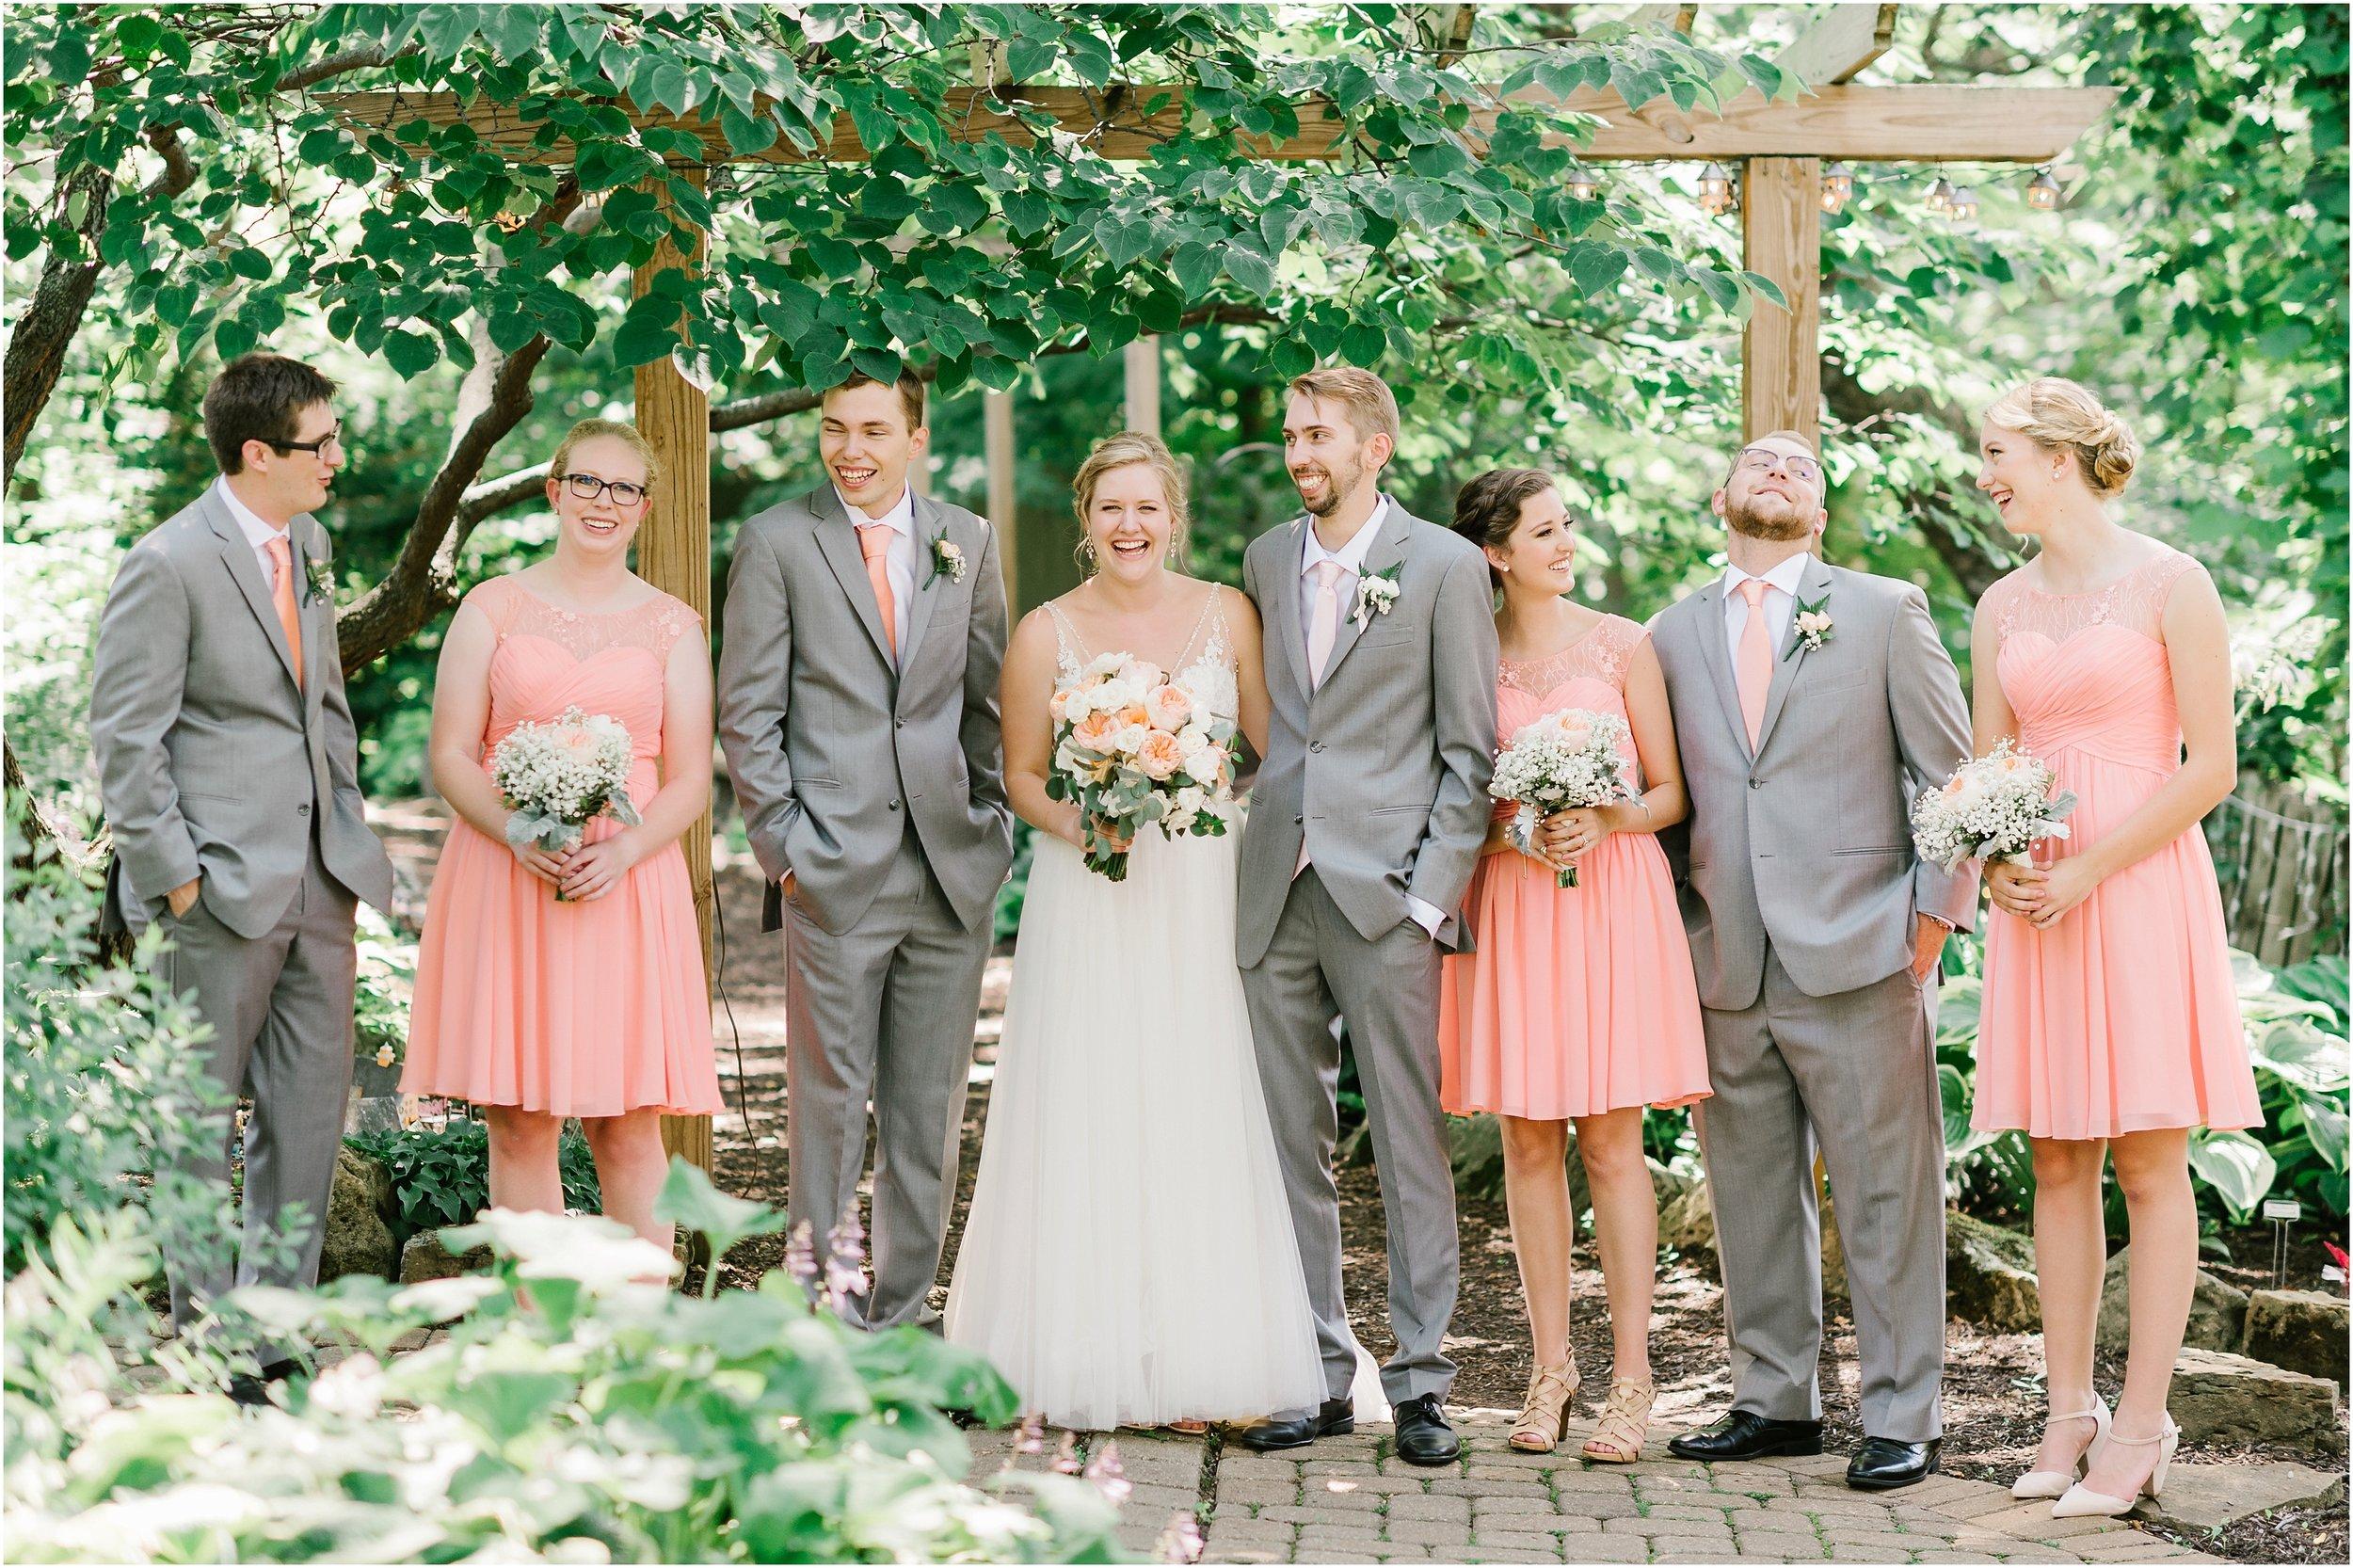 Rebecca_Shehorn_Photography_Indianapolis_Wedding_Photographer_8490.jpg